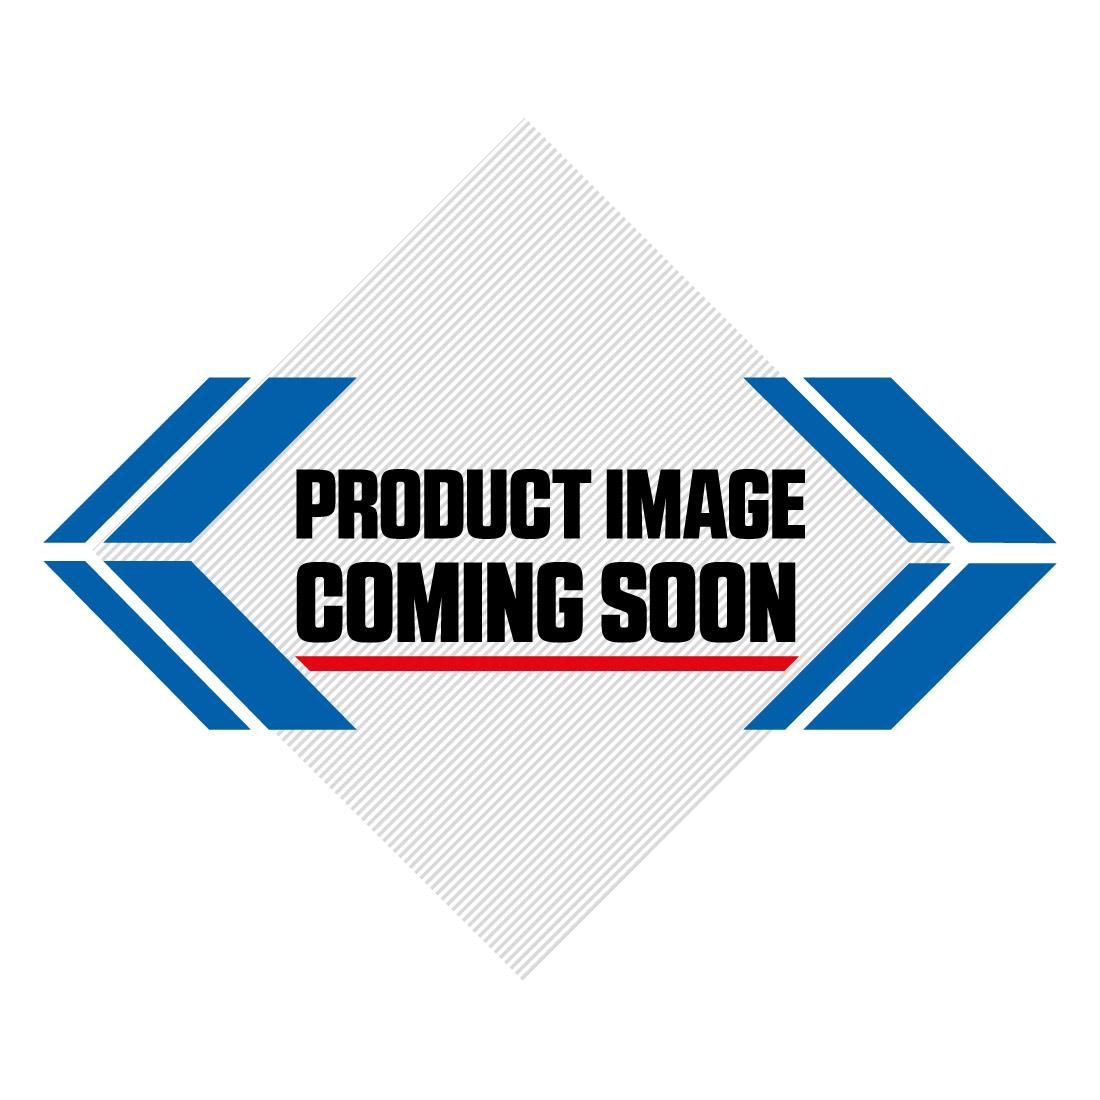 Suzuki Plastic Kit Suzuki RMZ 450 (08-17) White Image-4